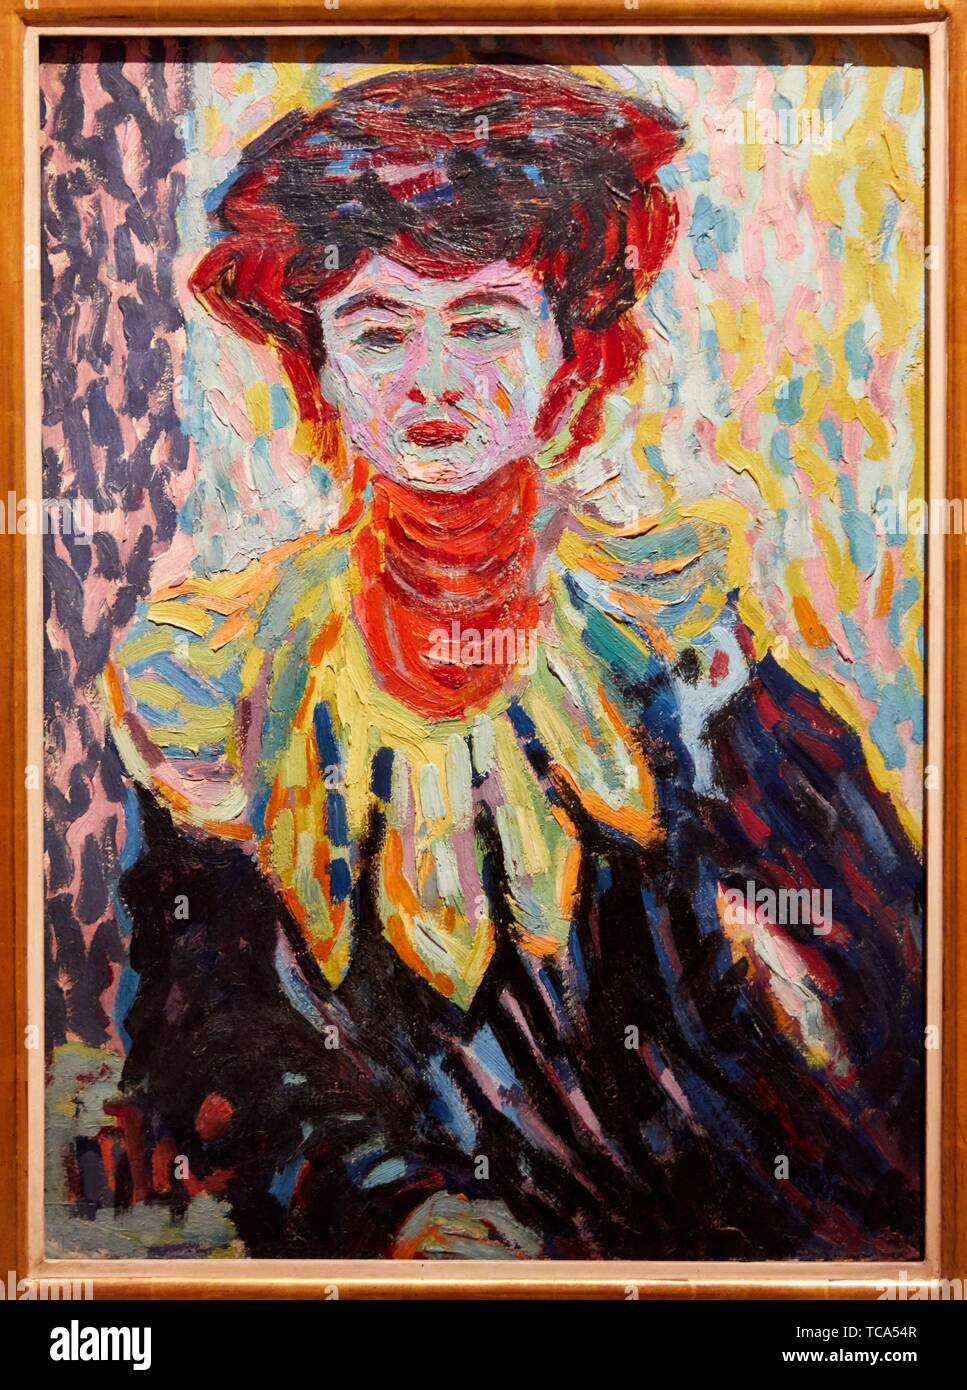 '''Doris with Ruff Collar'', 1906, Ernst Ludwig Kichner, Thyssen Bornemisza Museum, Madrid, Spain, Europe - Stock Image